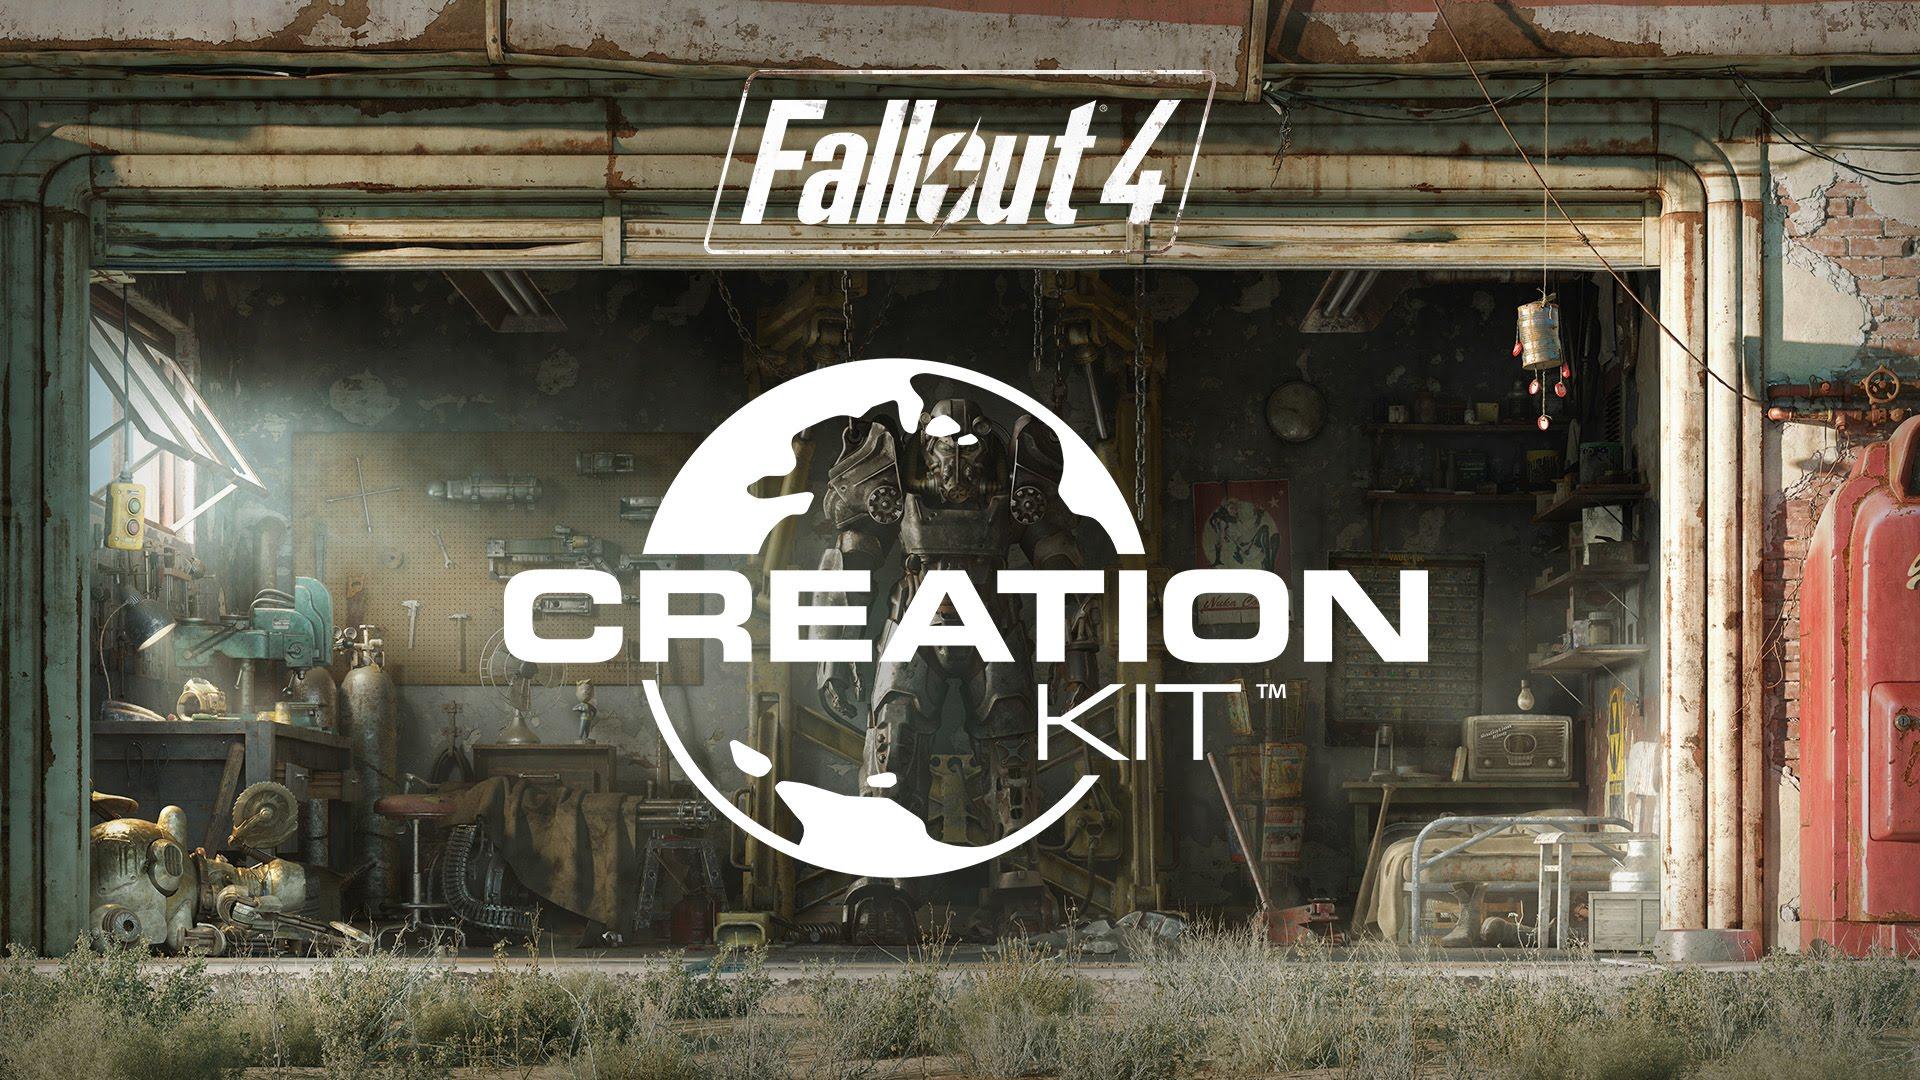 Fallout 4 creation kit